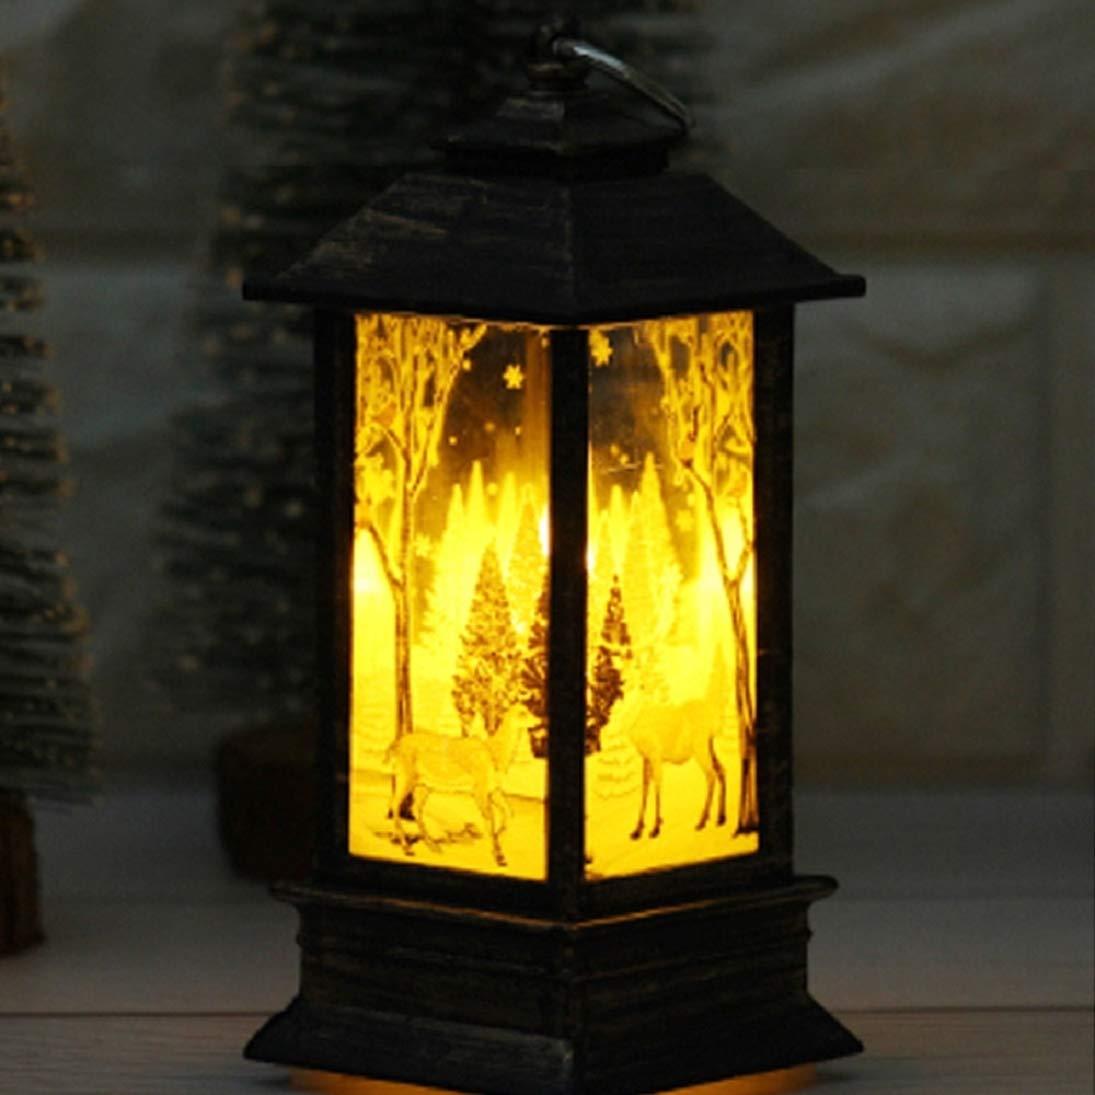 Gallity Nightlight Decoration Christmas Candles, LED Tea Light Christmas Candles Christmas Decoration (2PCS)